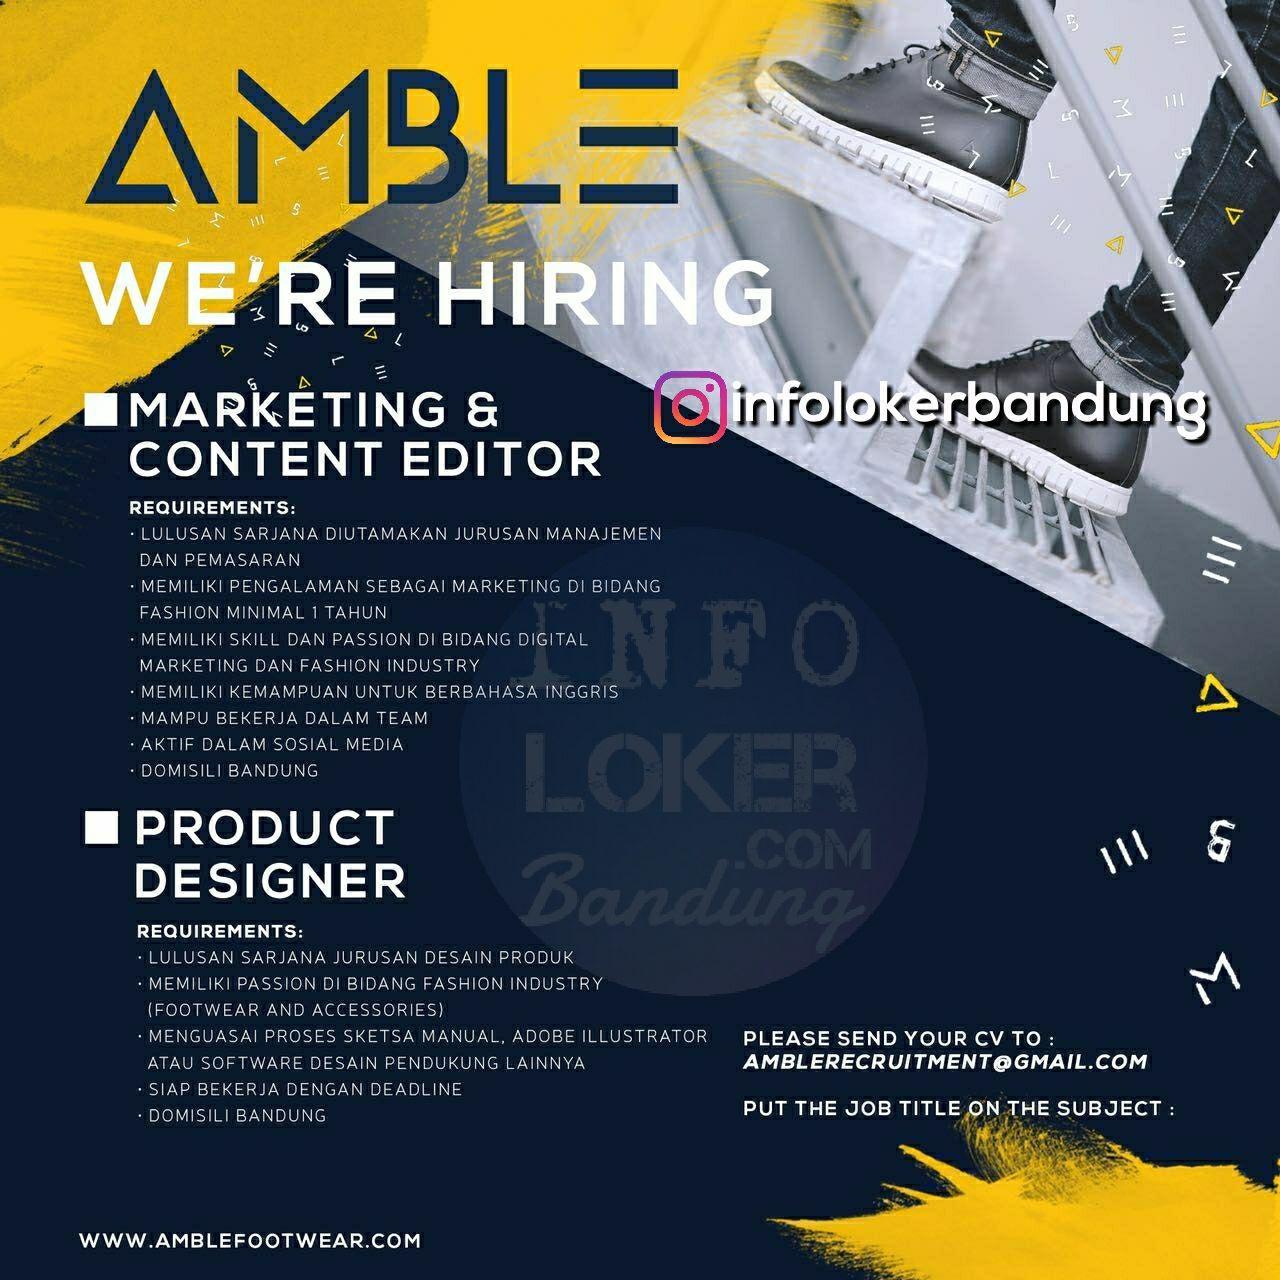 Lowongan Kerja Amble Footwear Bandung Maret 2018